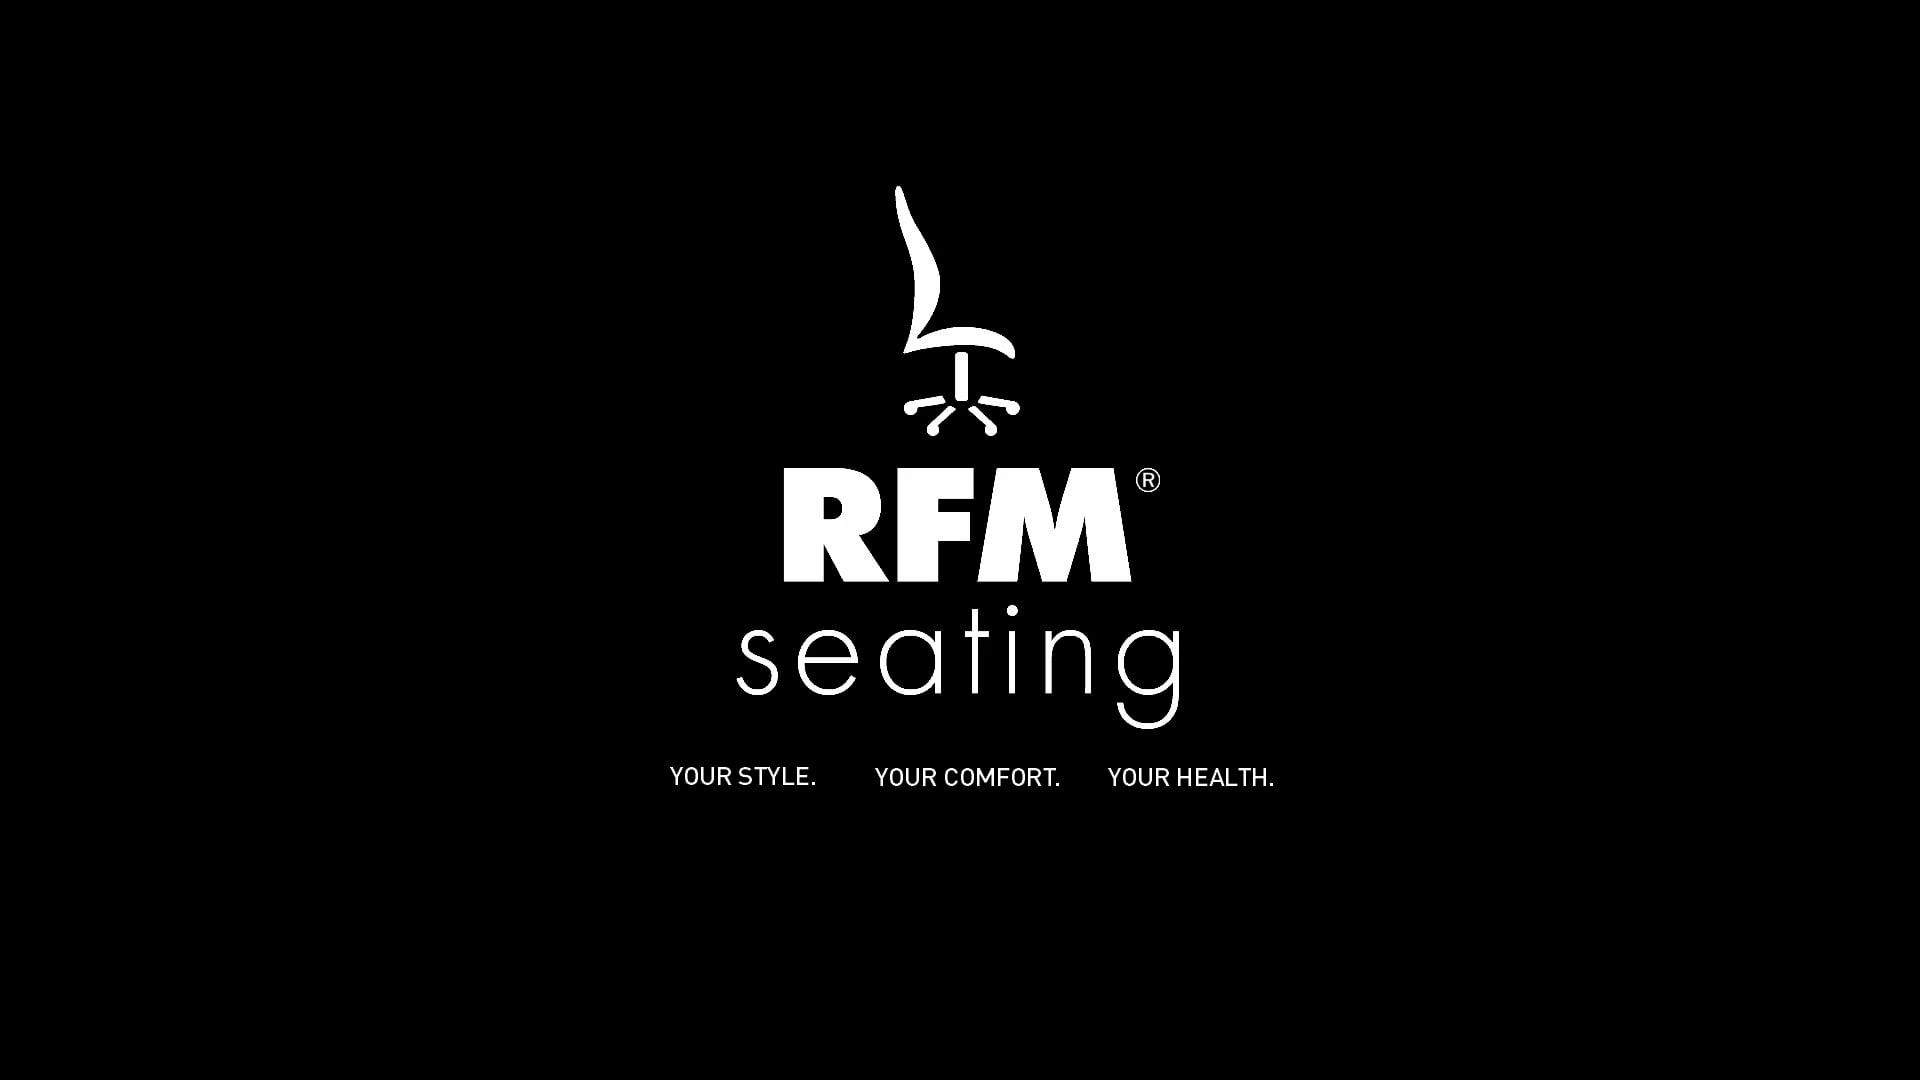 RFM Seating Promo